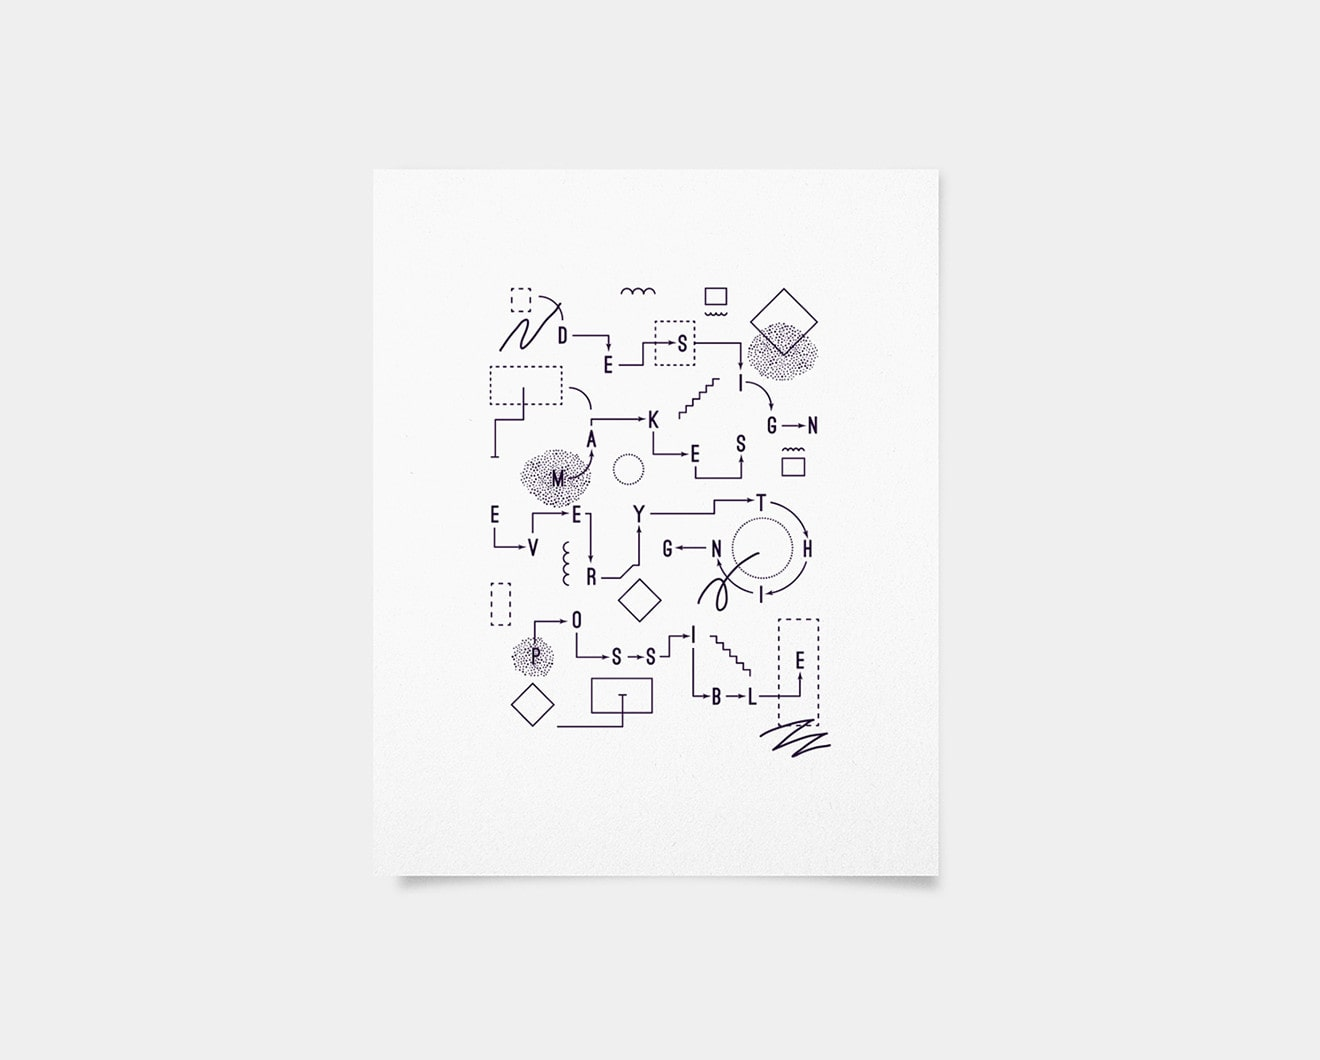 Design Makes Everything Possible - Hvass & Hannibal